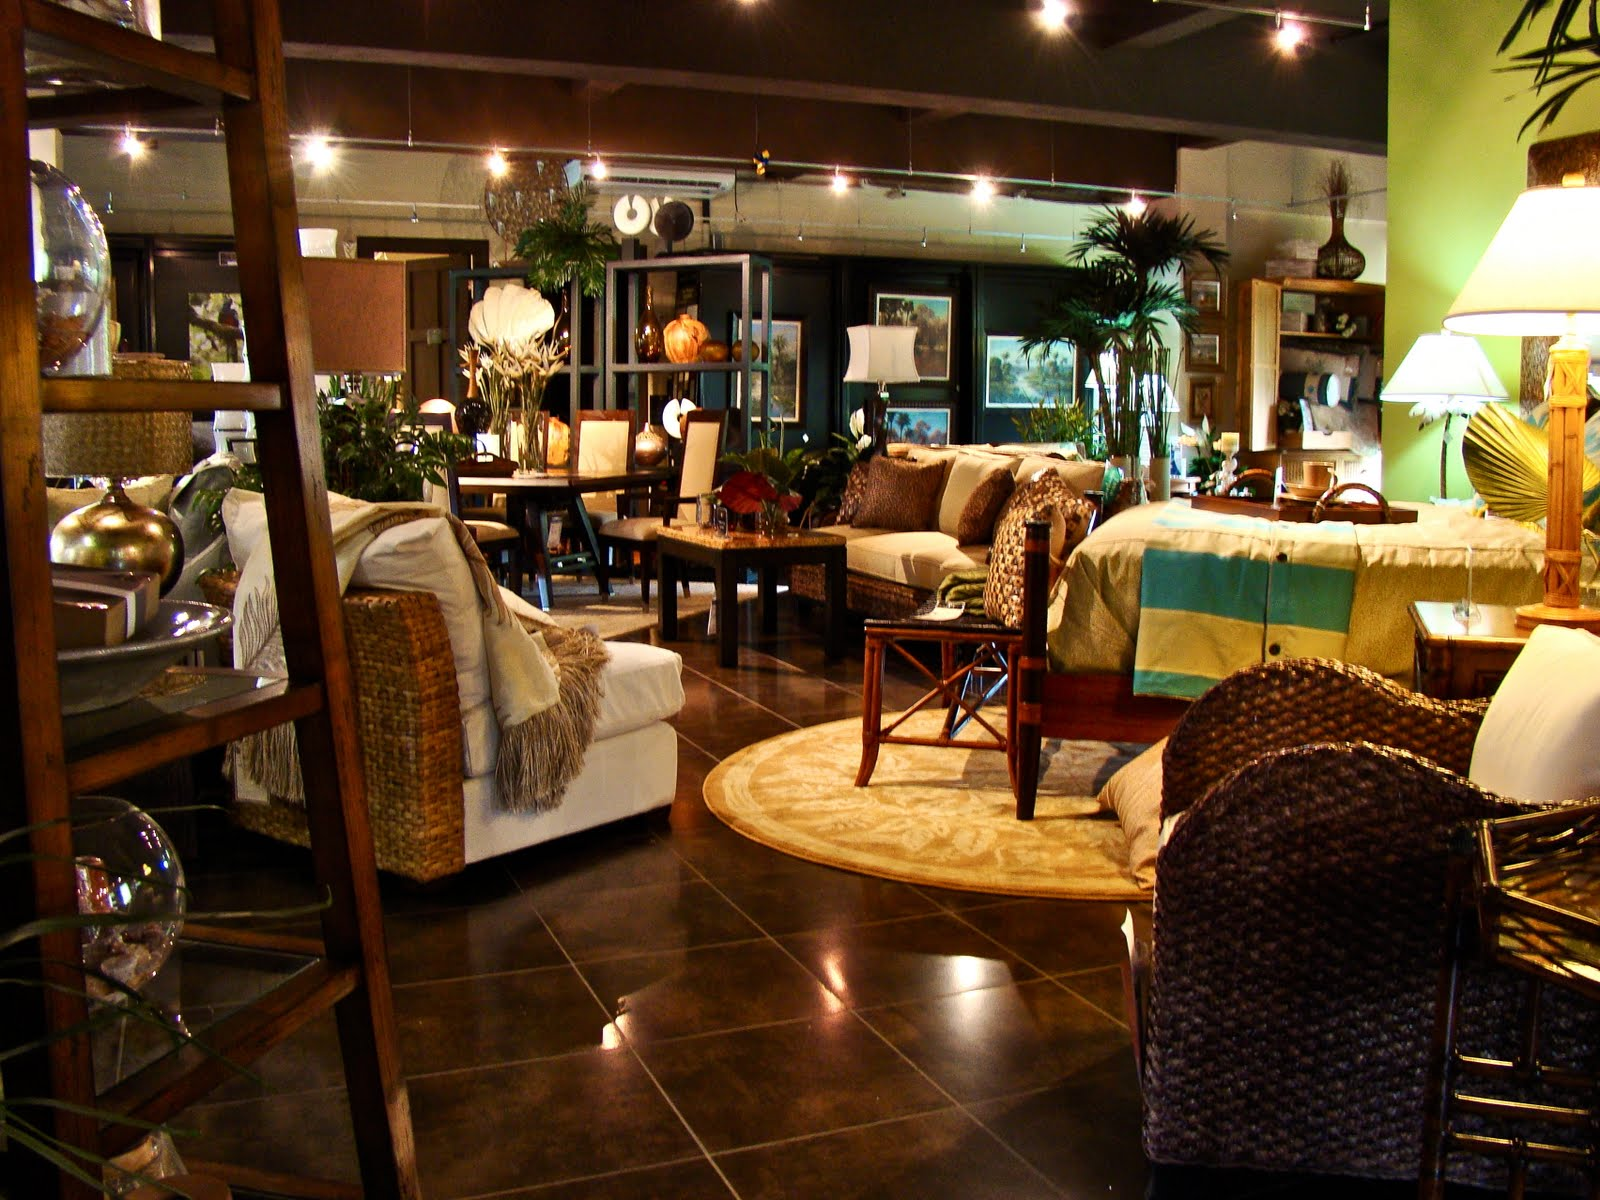 Tamarindo, Costa Rica Daily Photo: Furniture Store